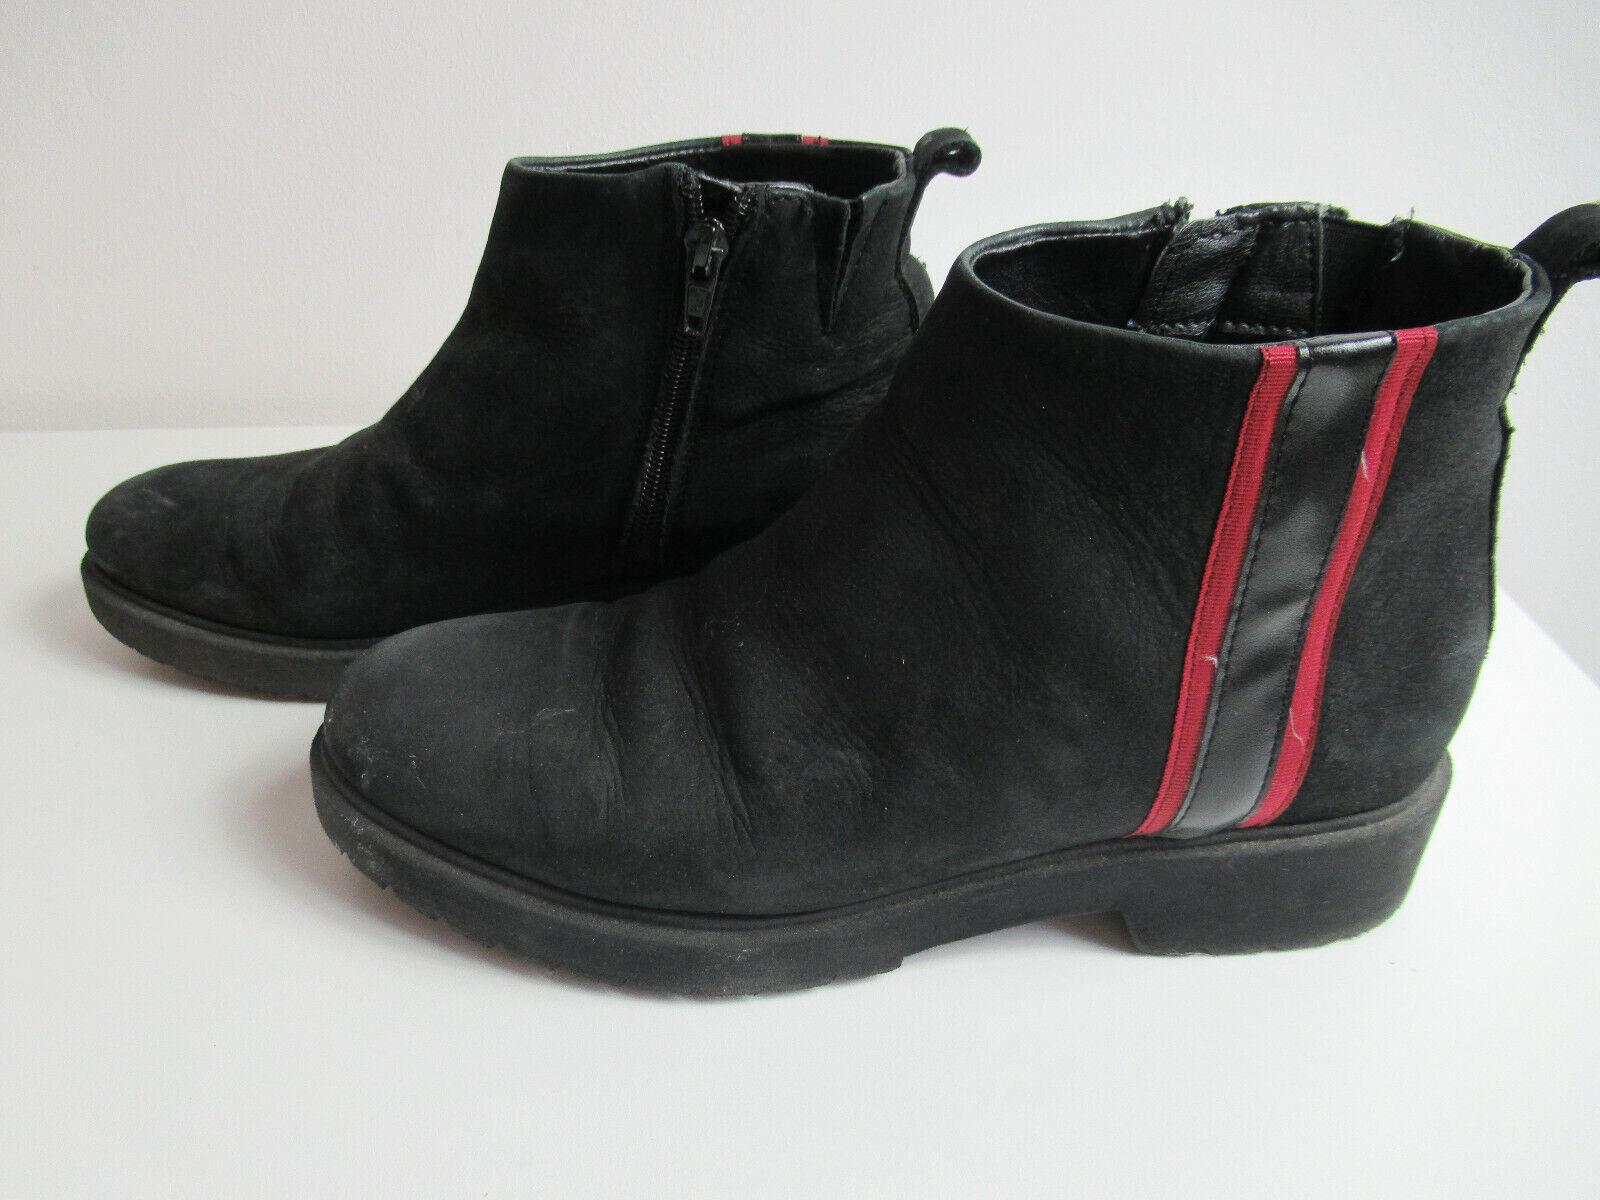 Damen - Frauen Schuhe Gr. 38 Schwarz  / flacheStiefelletten / Sneaker / Boots